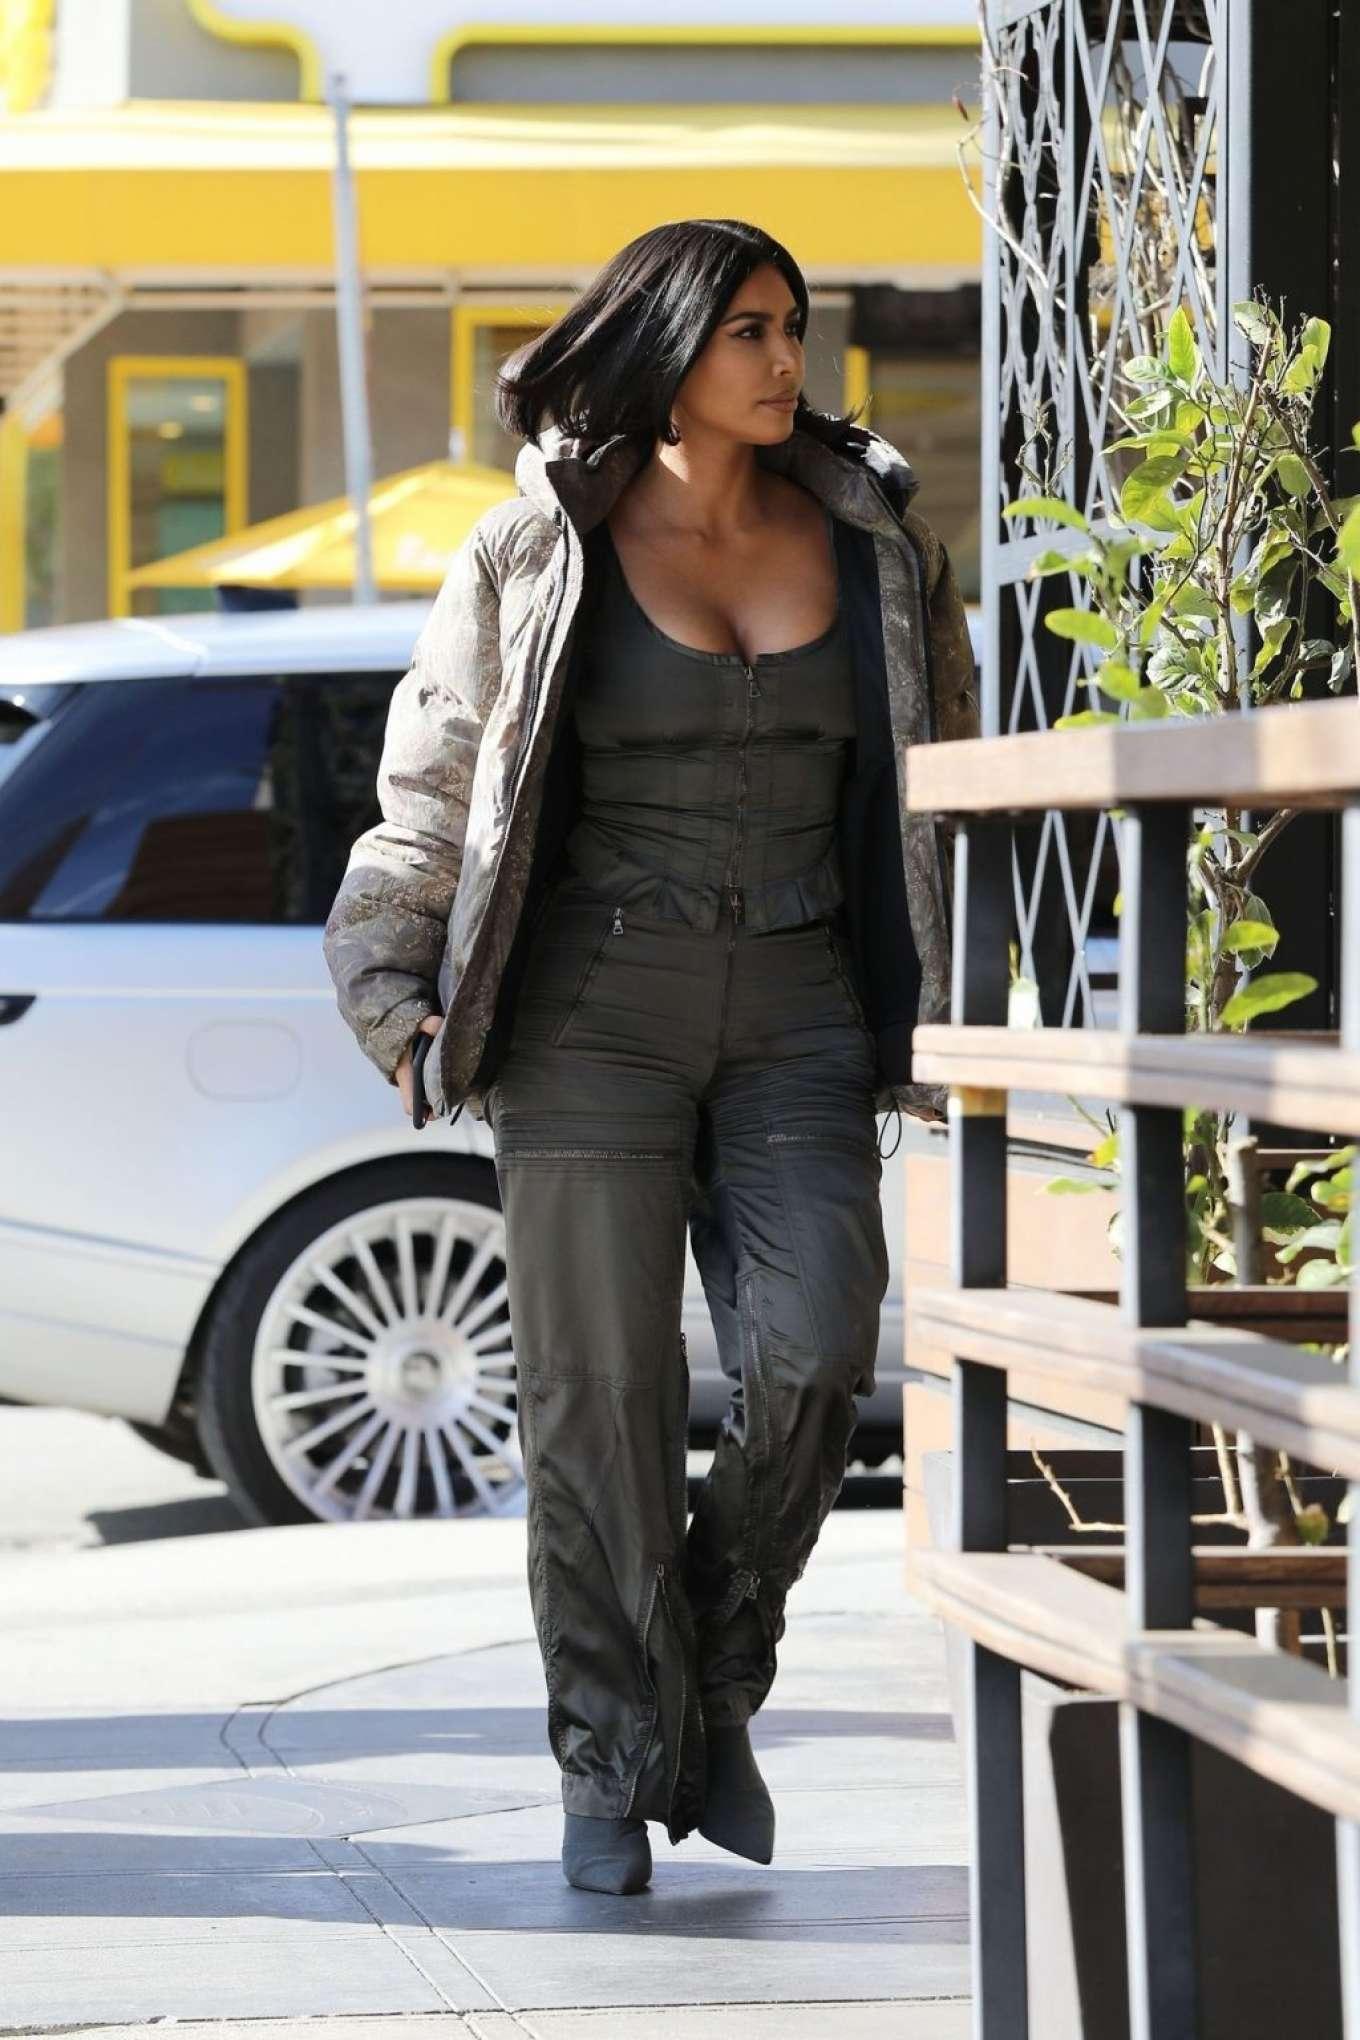 Kim Kardashian donning Dark grey straight fit pants with side pockets